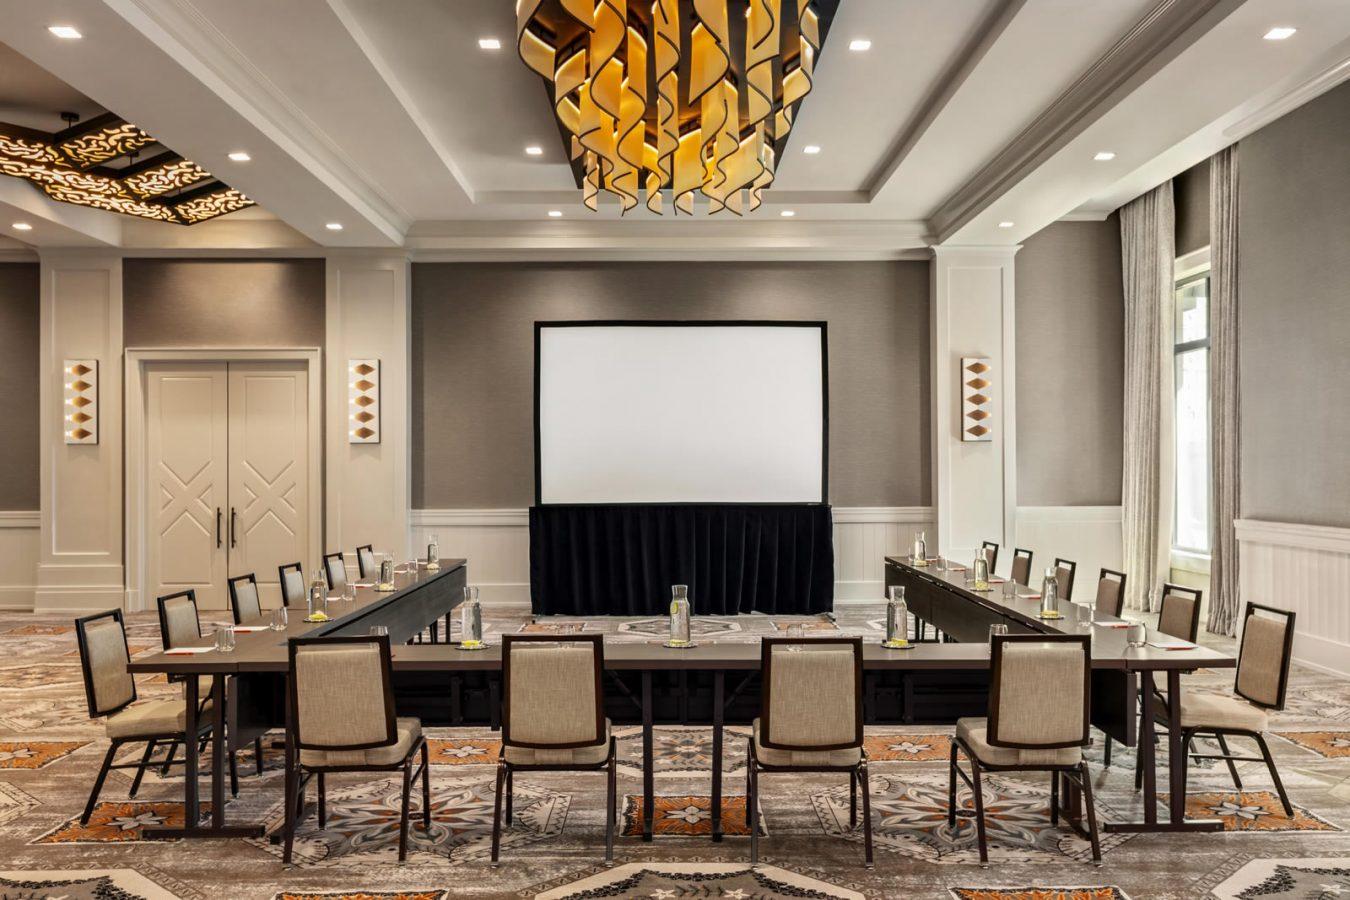 Business meeting in the Harpeth Riverside Ballroom